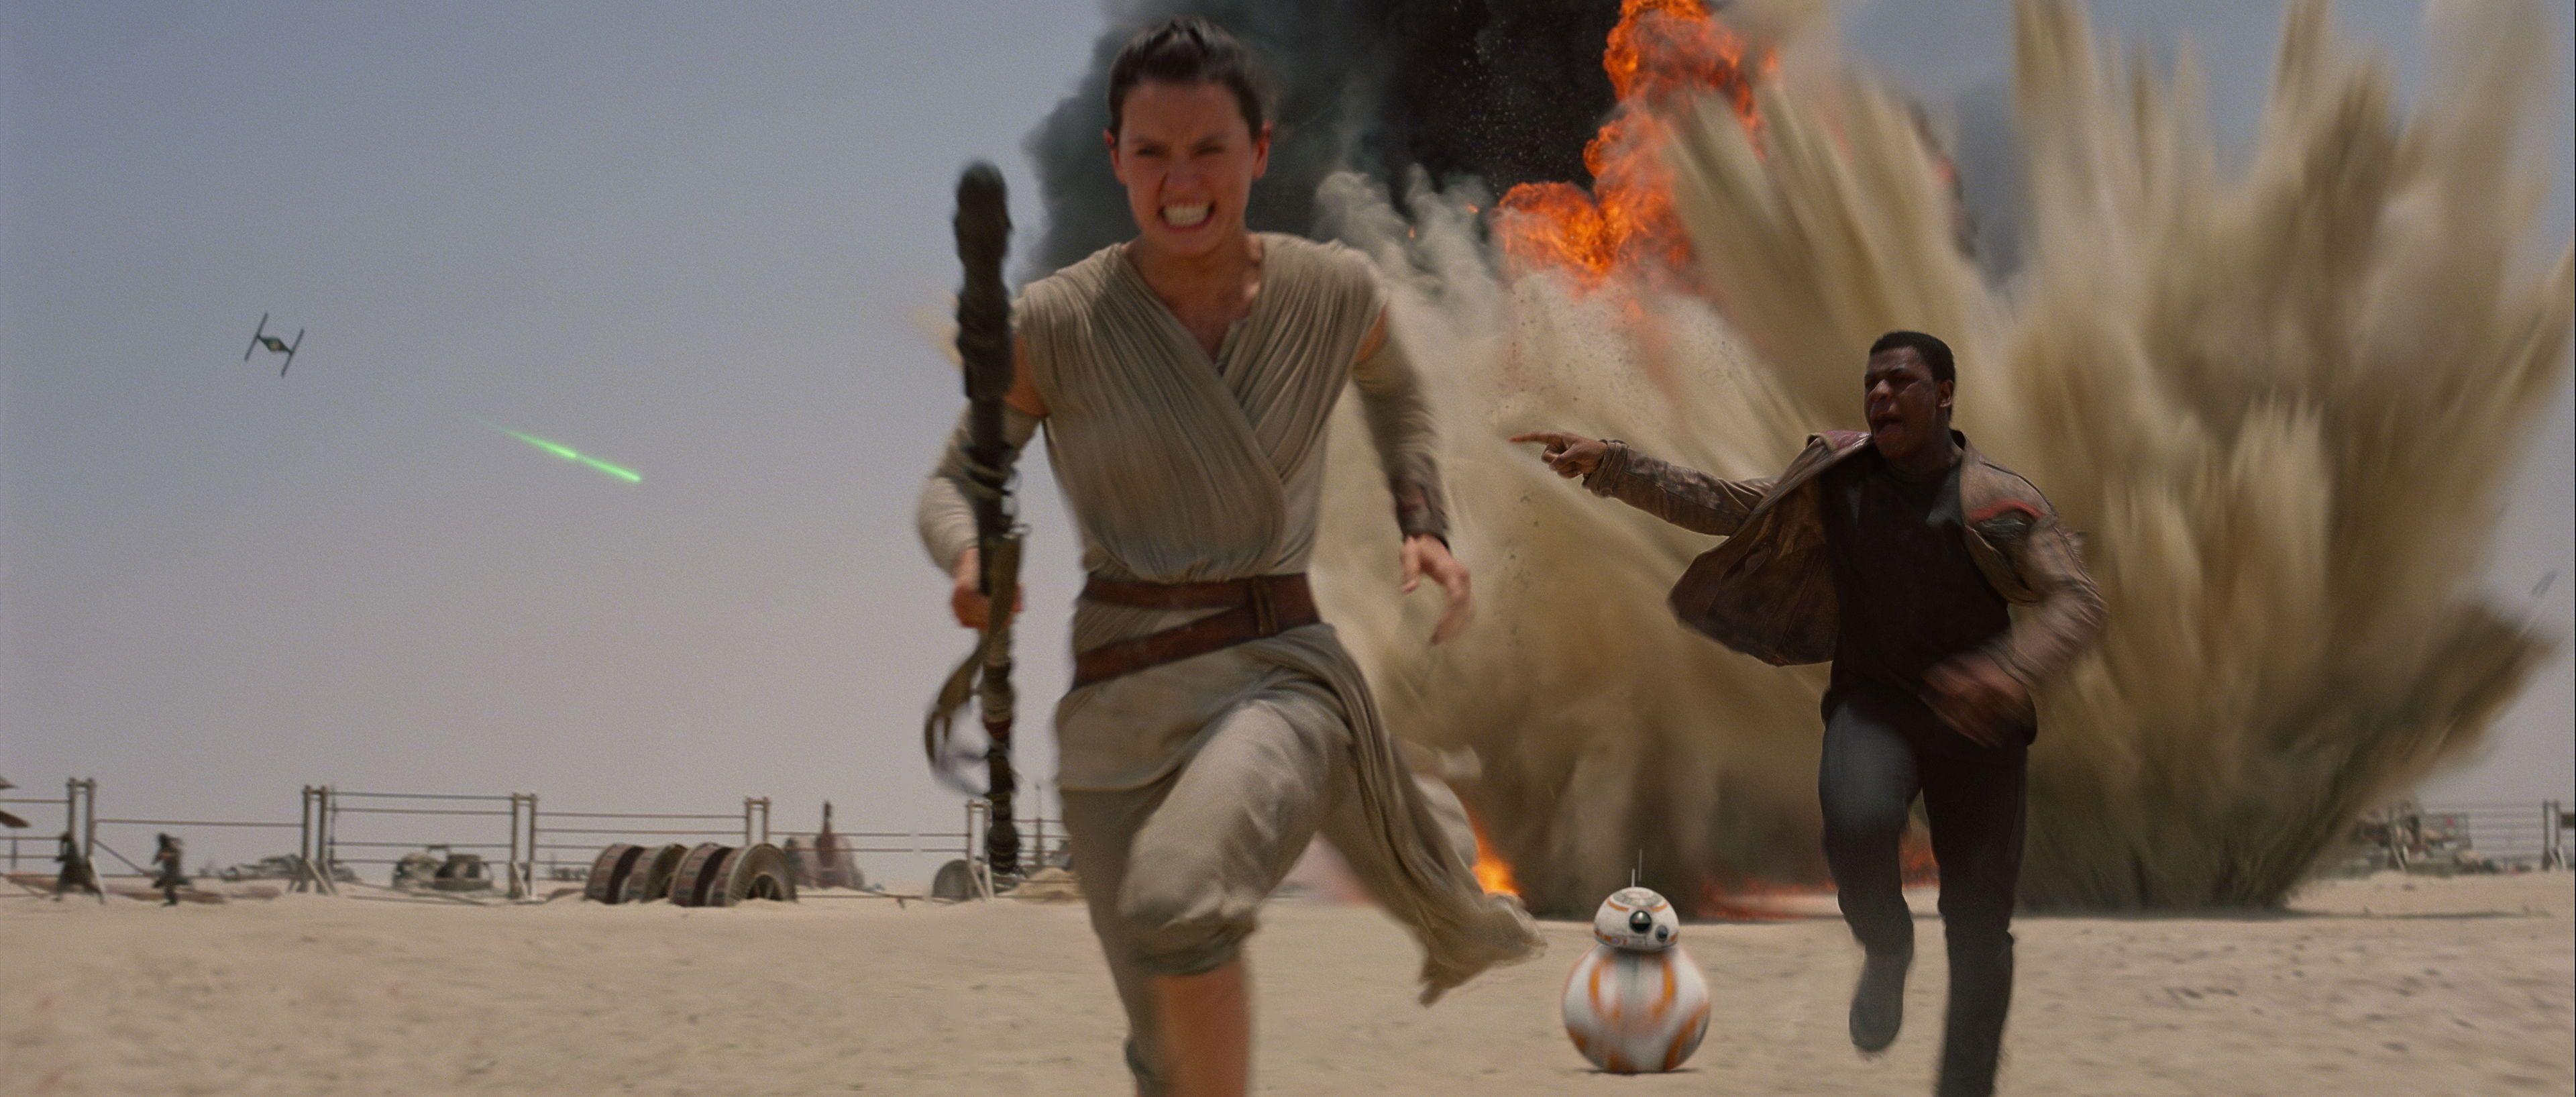 Star Wars The Force Awakens - Rey, Finn and BB-8 run from TIE fighters on Jakku